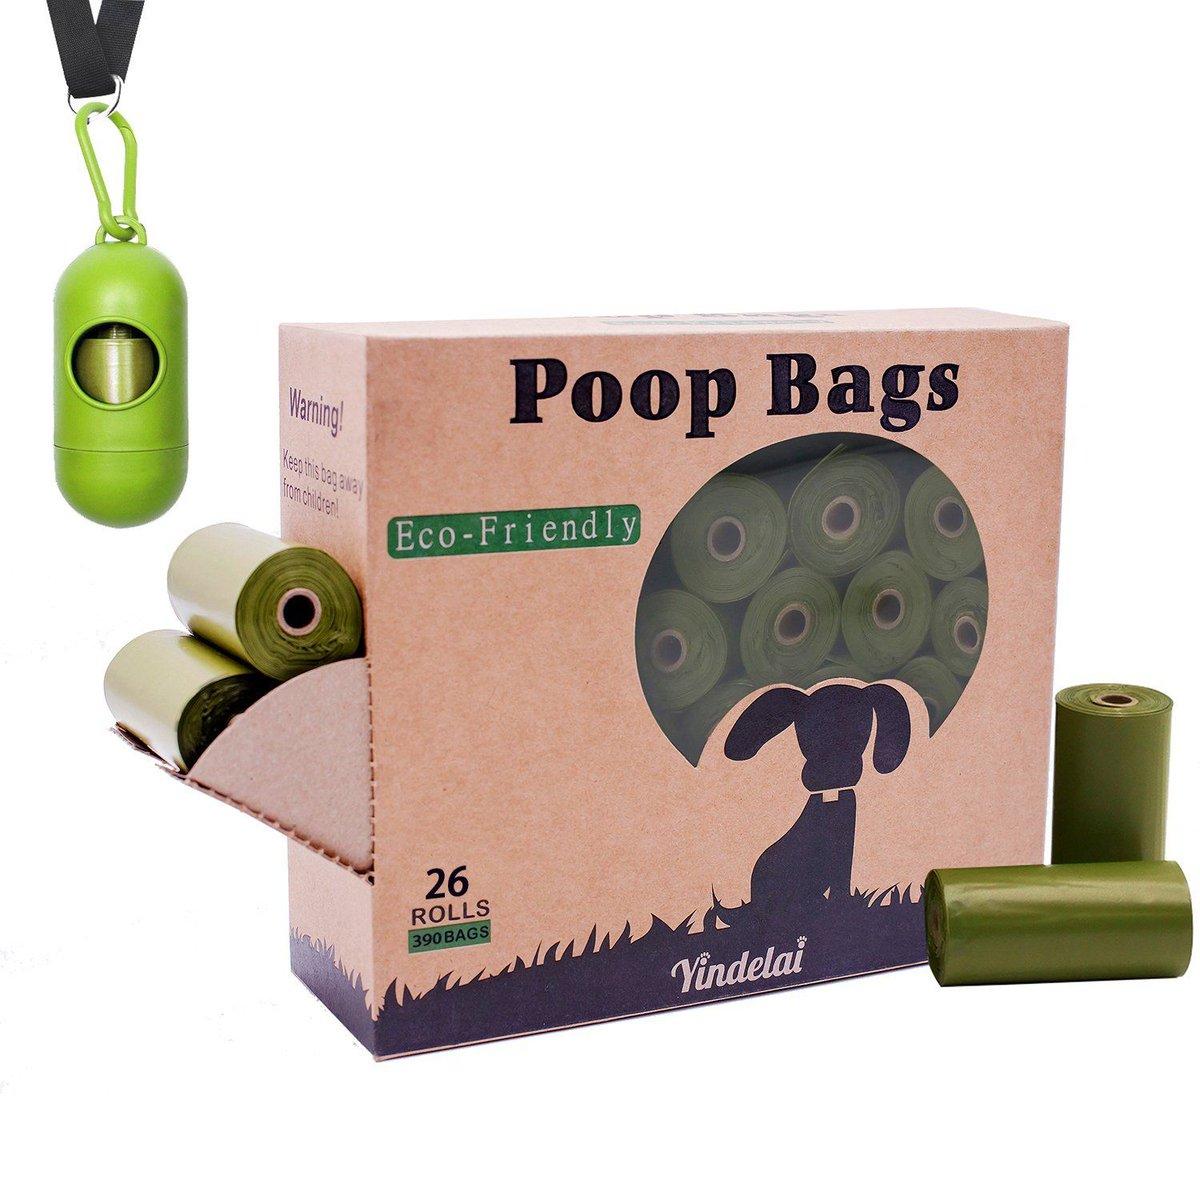 Fat Kid Deals On Twitter Grab A Massive Box Of 390 Dog Poop Bags